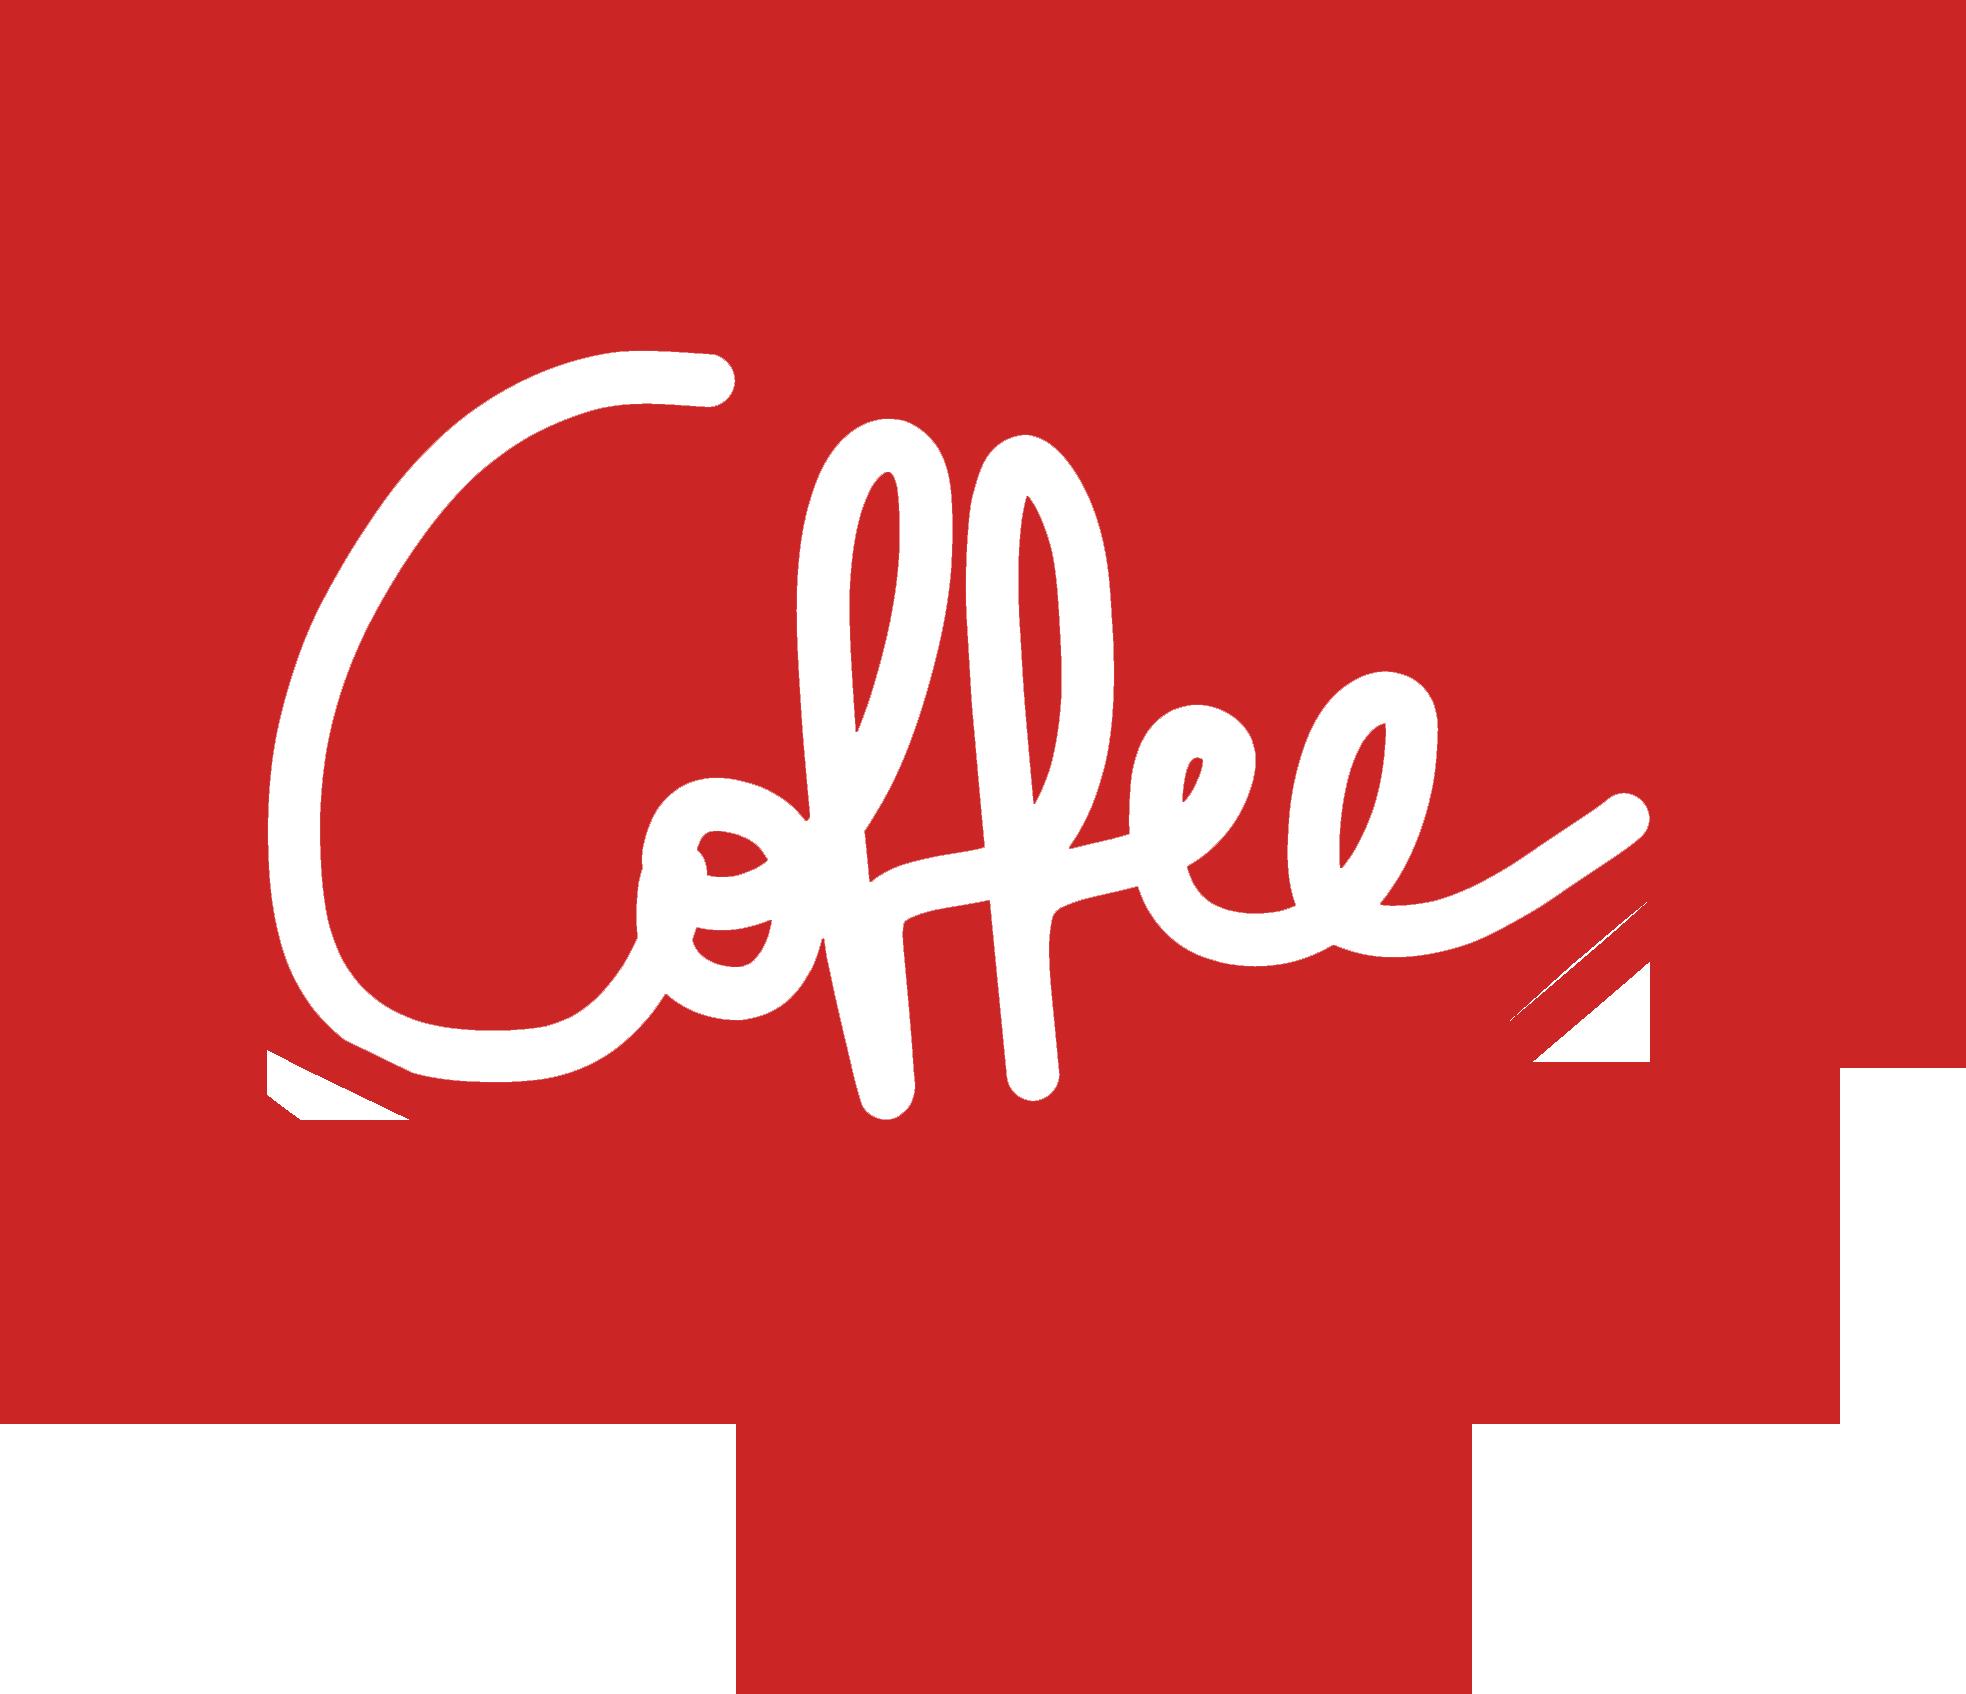 Coffee@4x.png